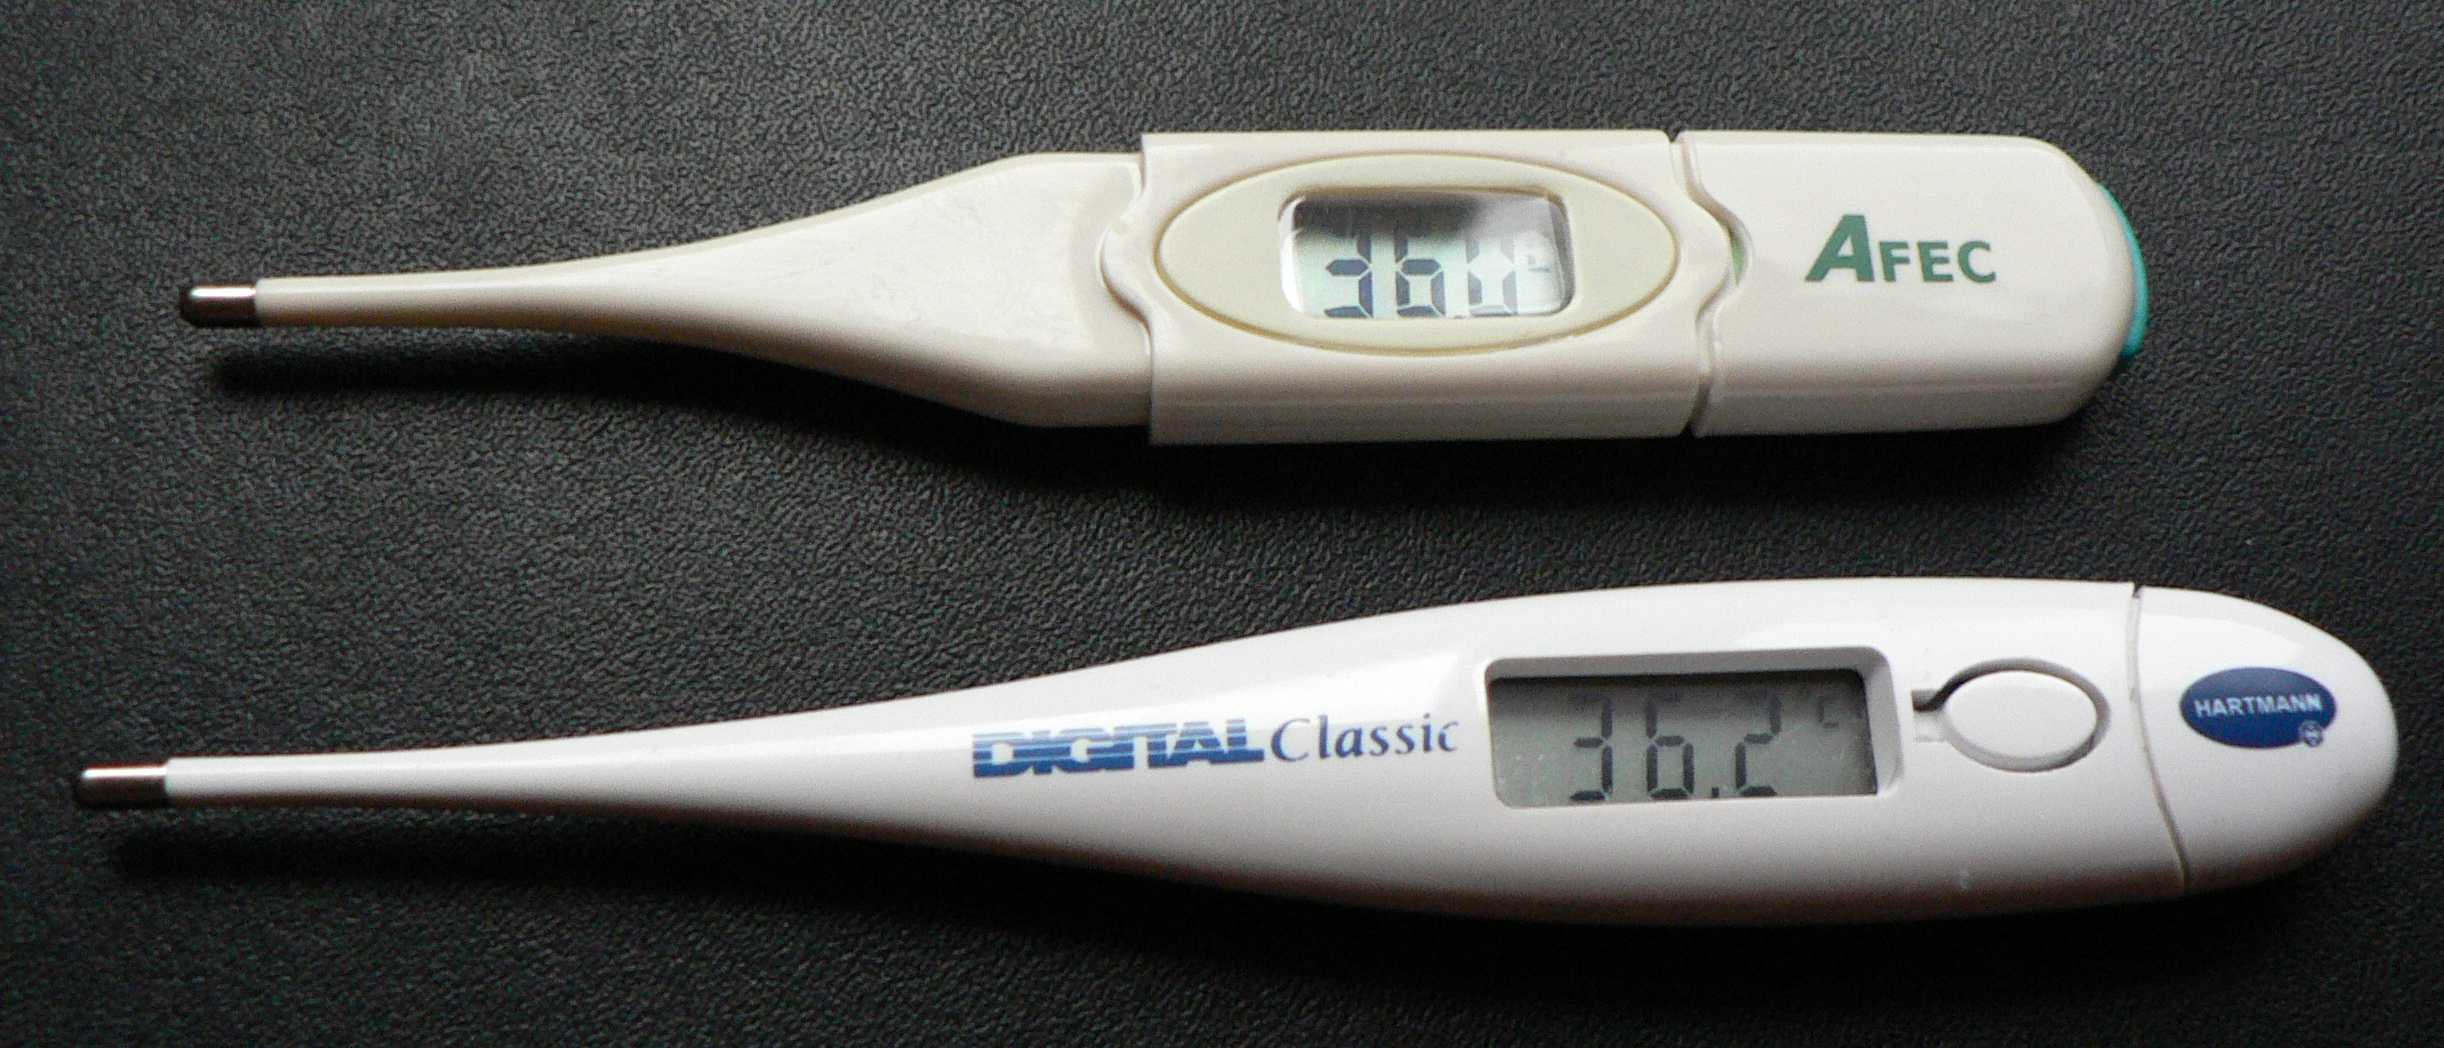 Temperatura en enfermeria wikipedia